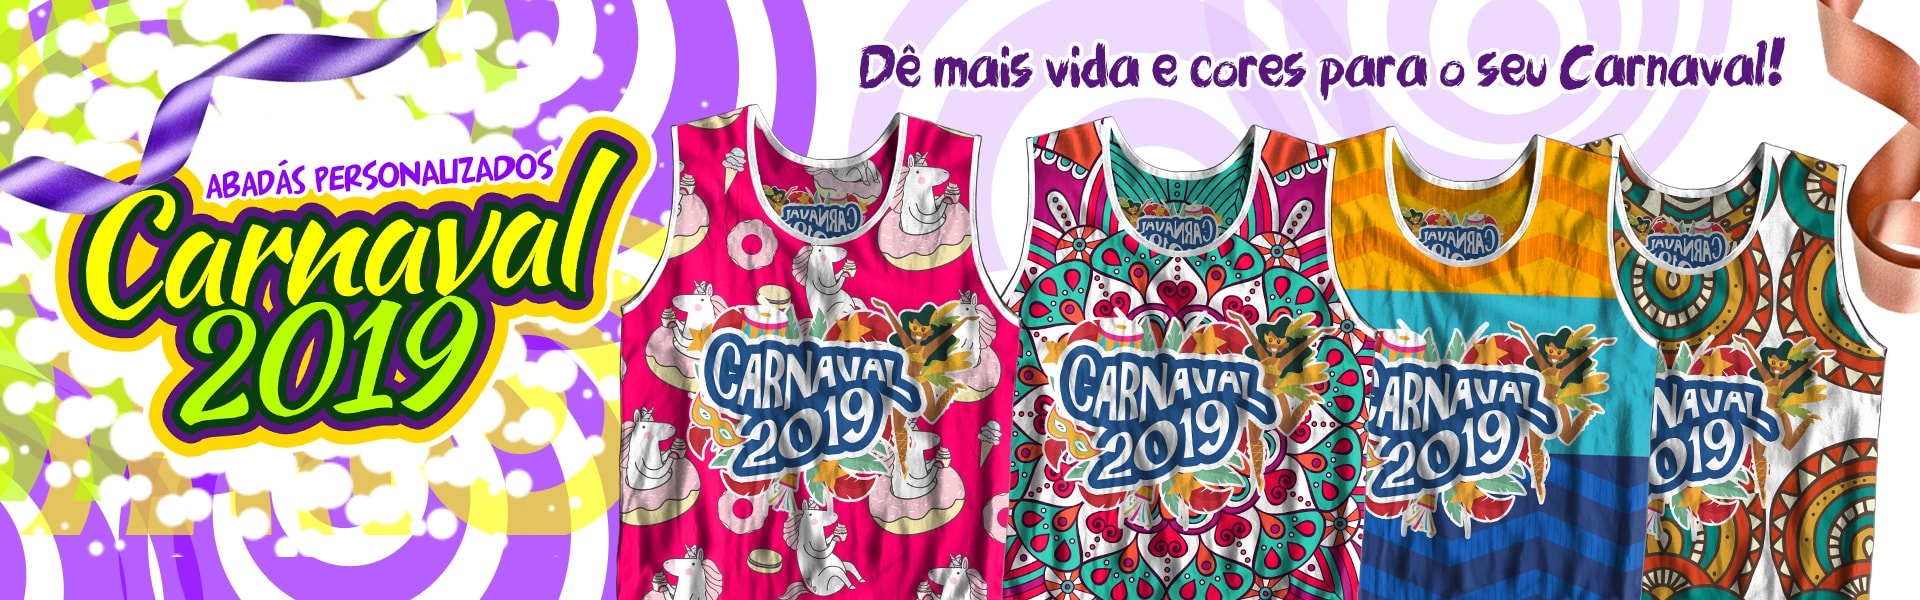 CARNAVAL 03-min